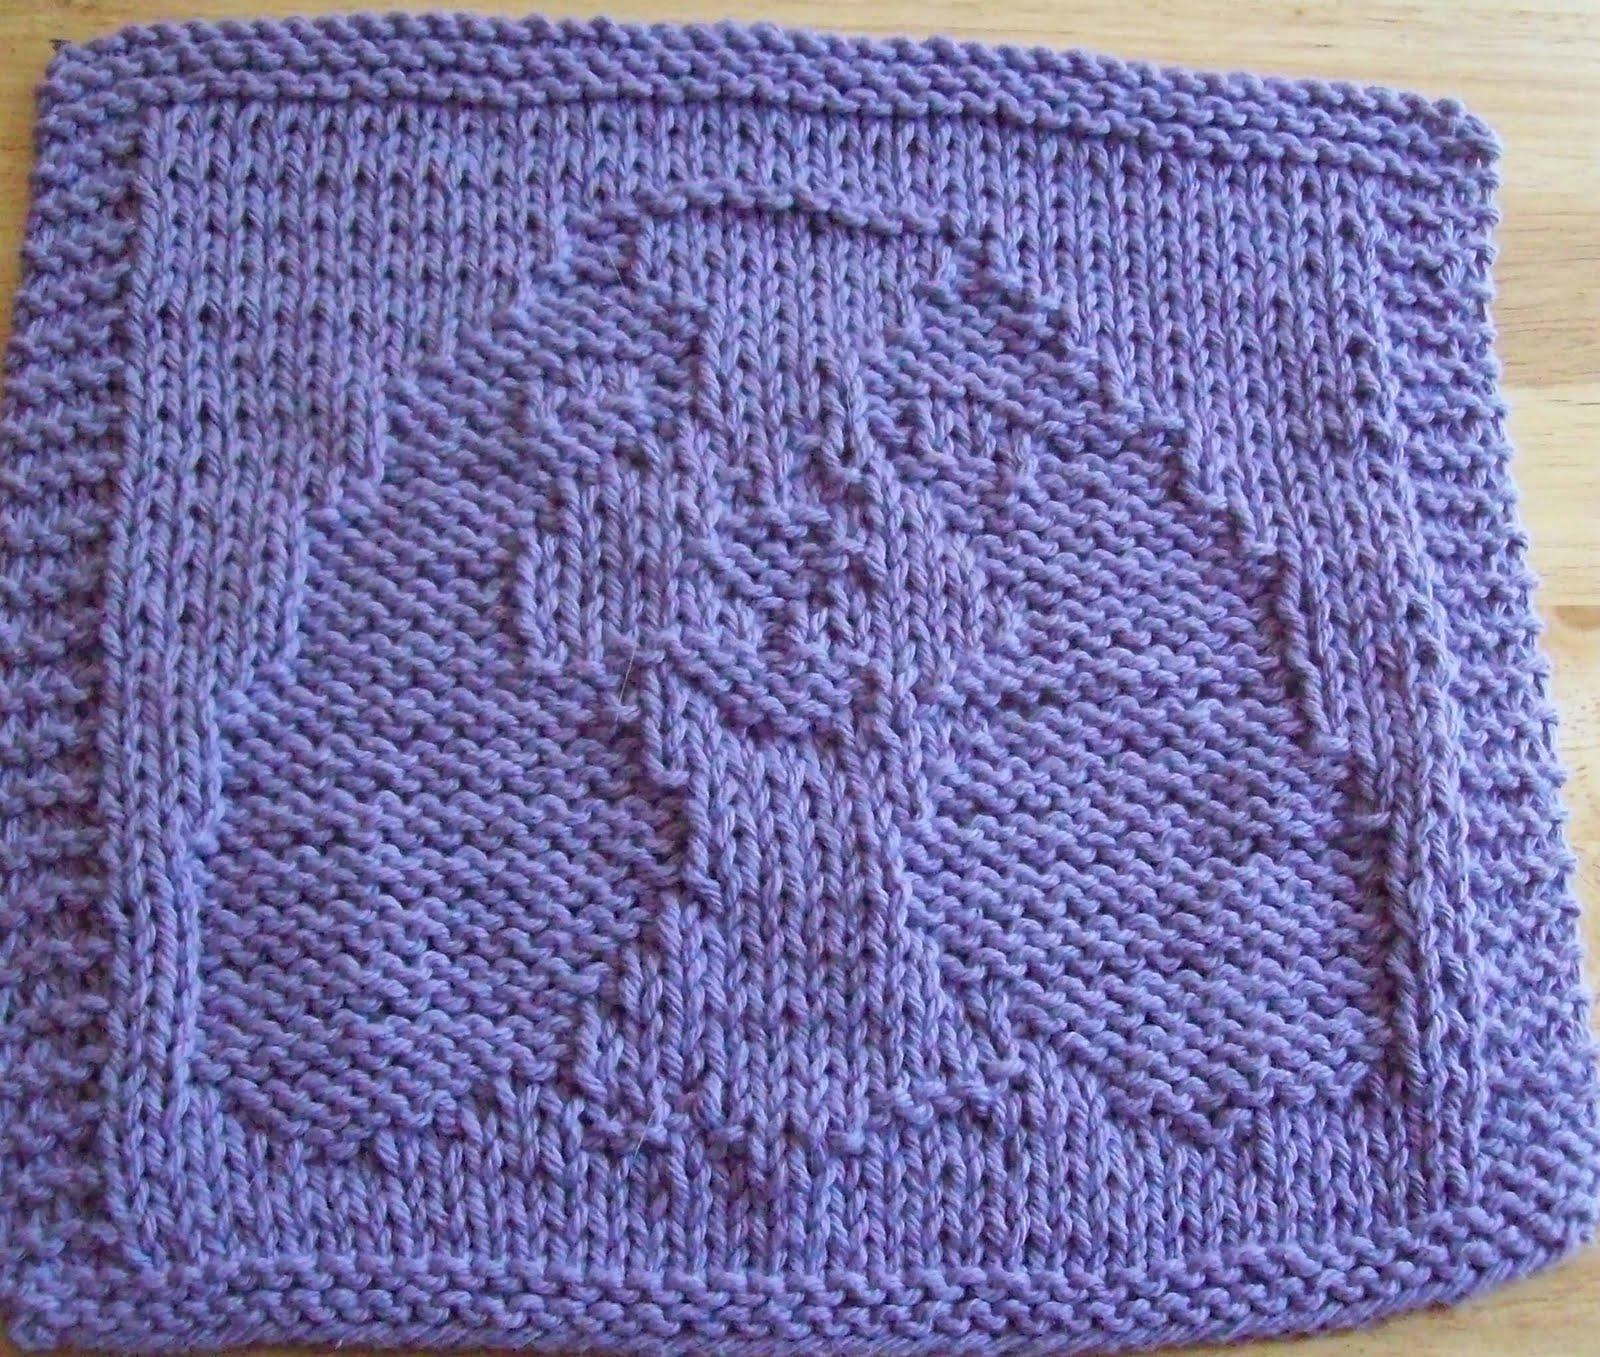 Dishcloth Knit Patterns : DigKnitty Designs: Spaniel Knit Dishcloth Pattern